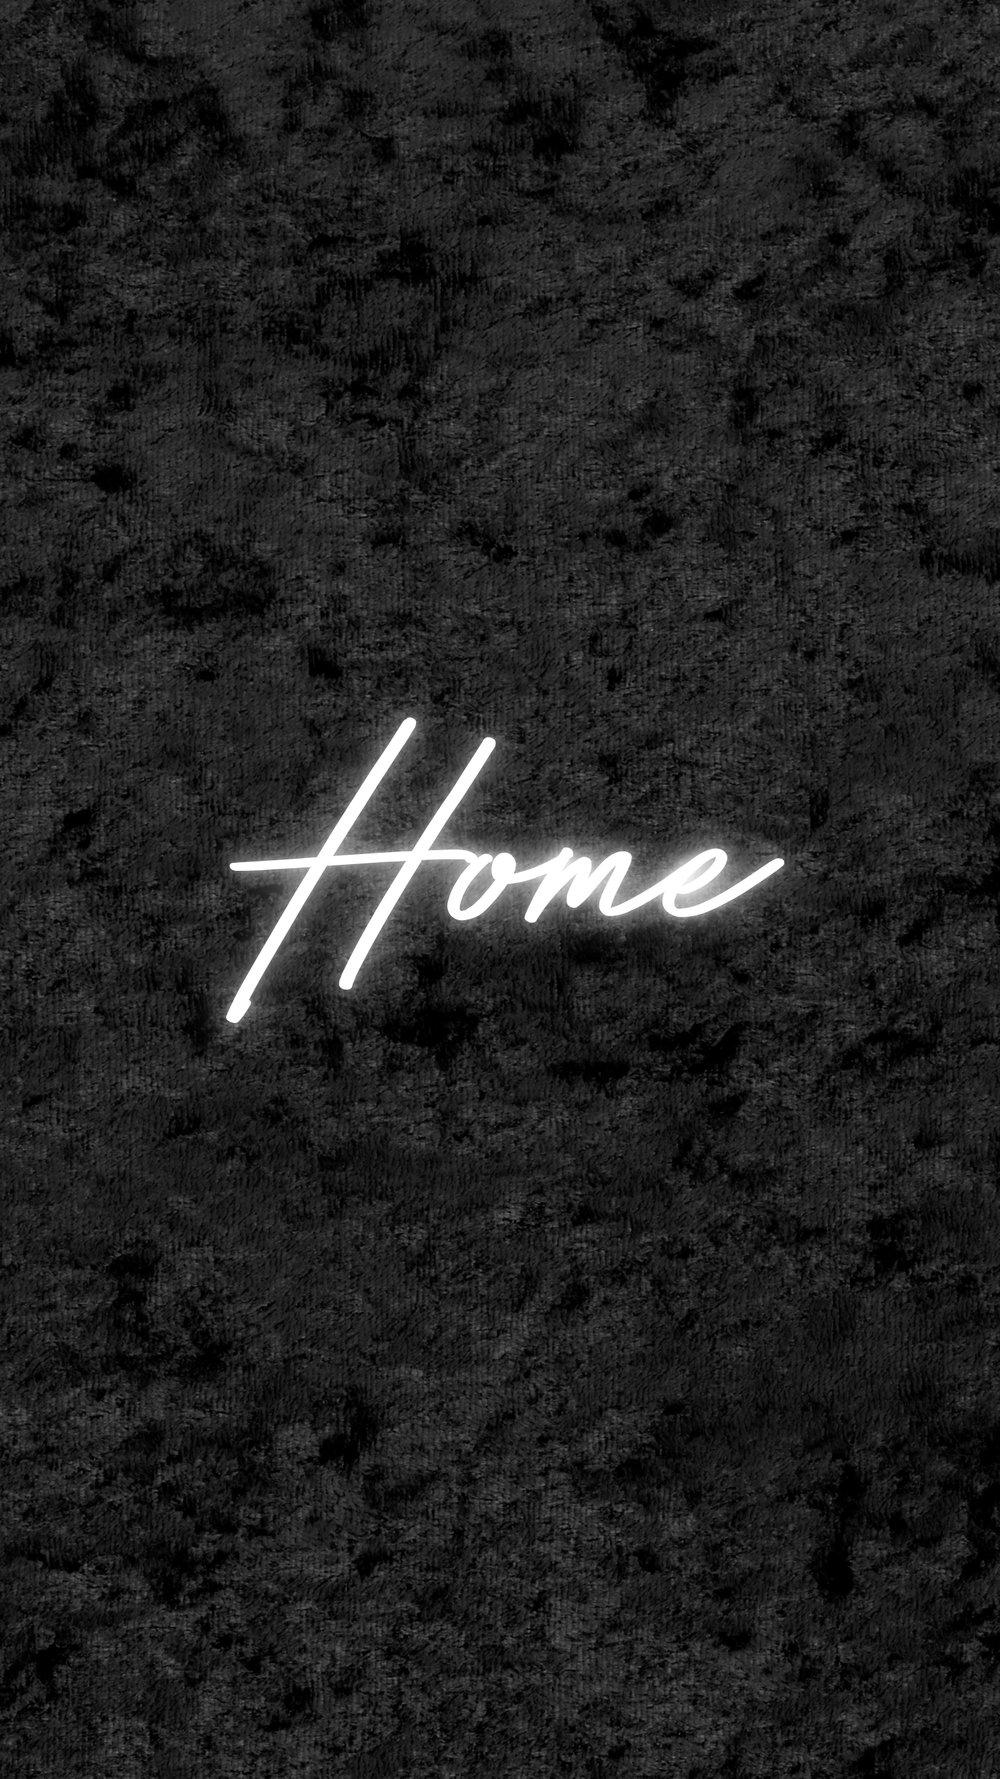 VE Home.jpg